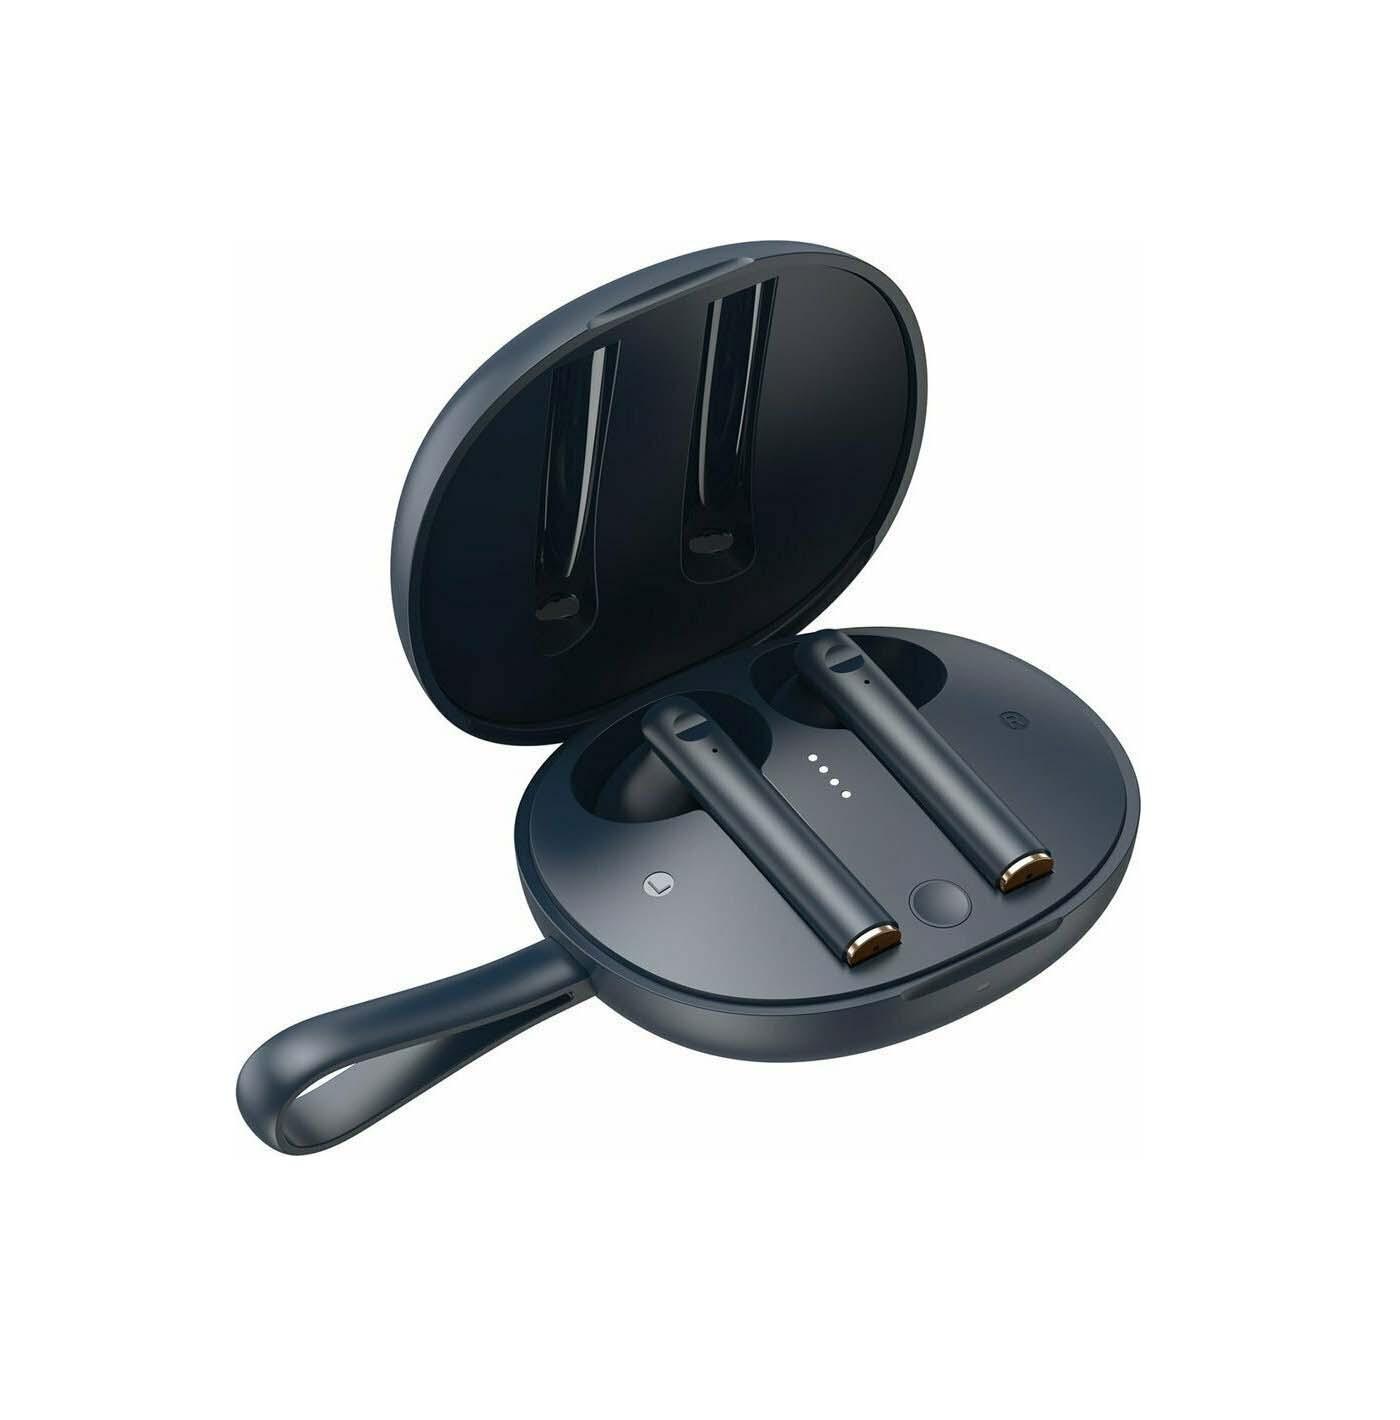 Baseus Encok W05 NGW05-03 Earbud Bluetooth Handsfree Navy Blue